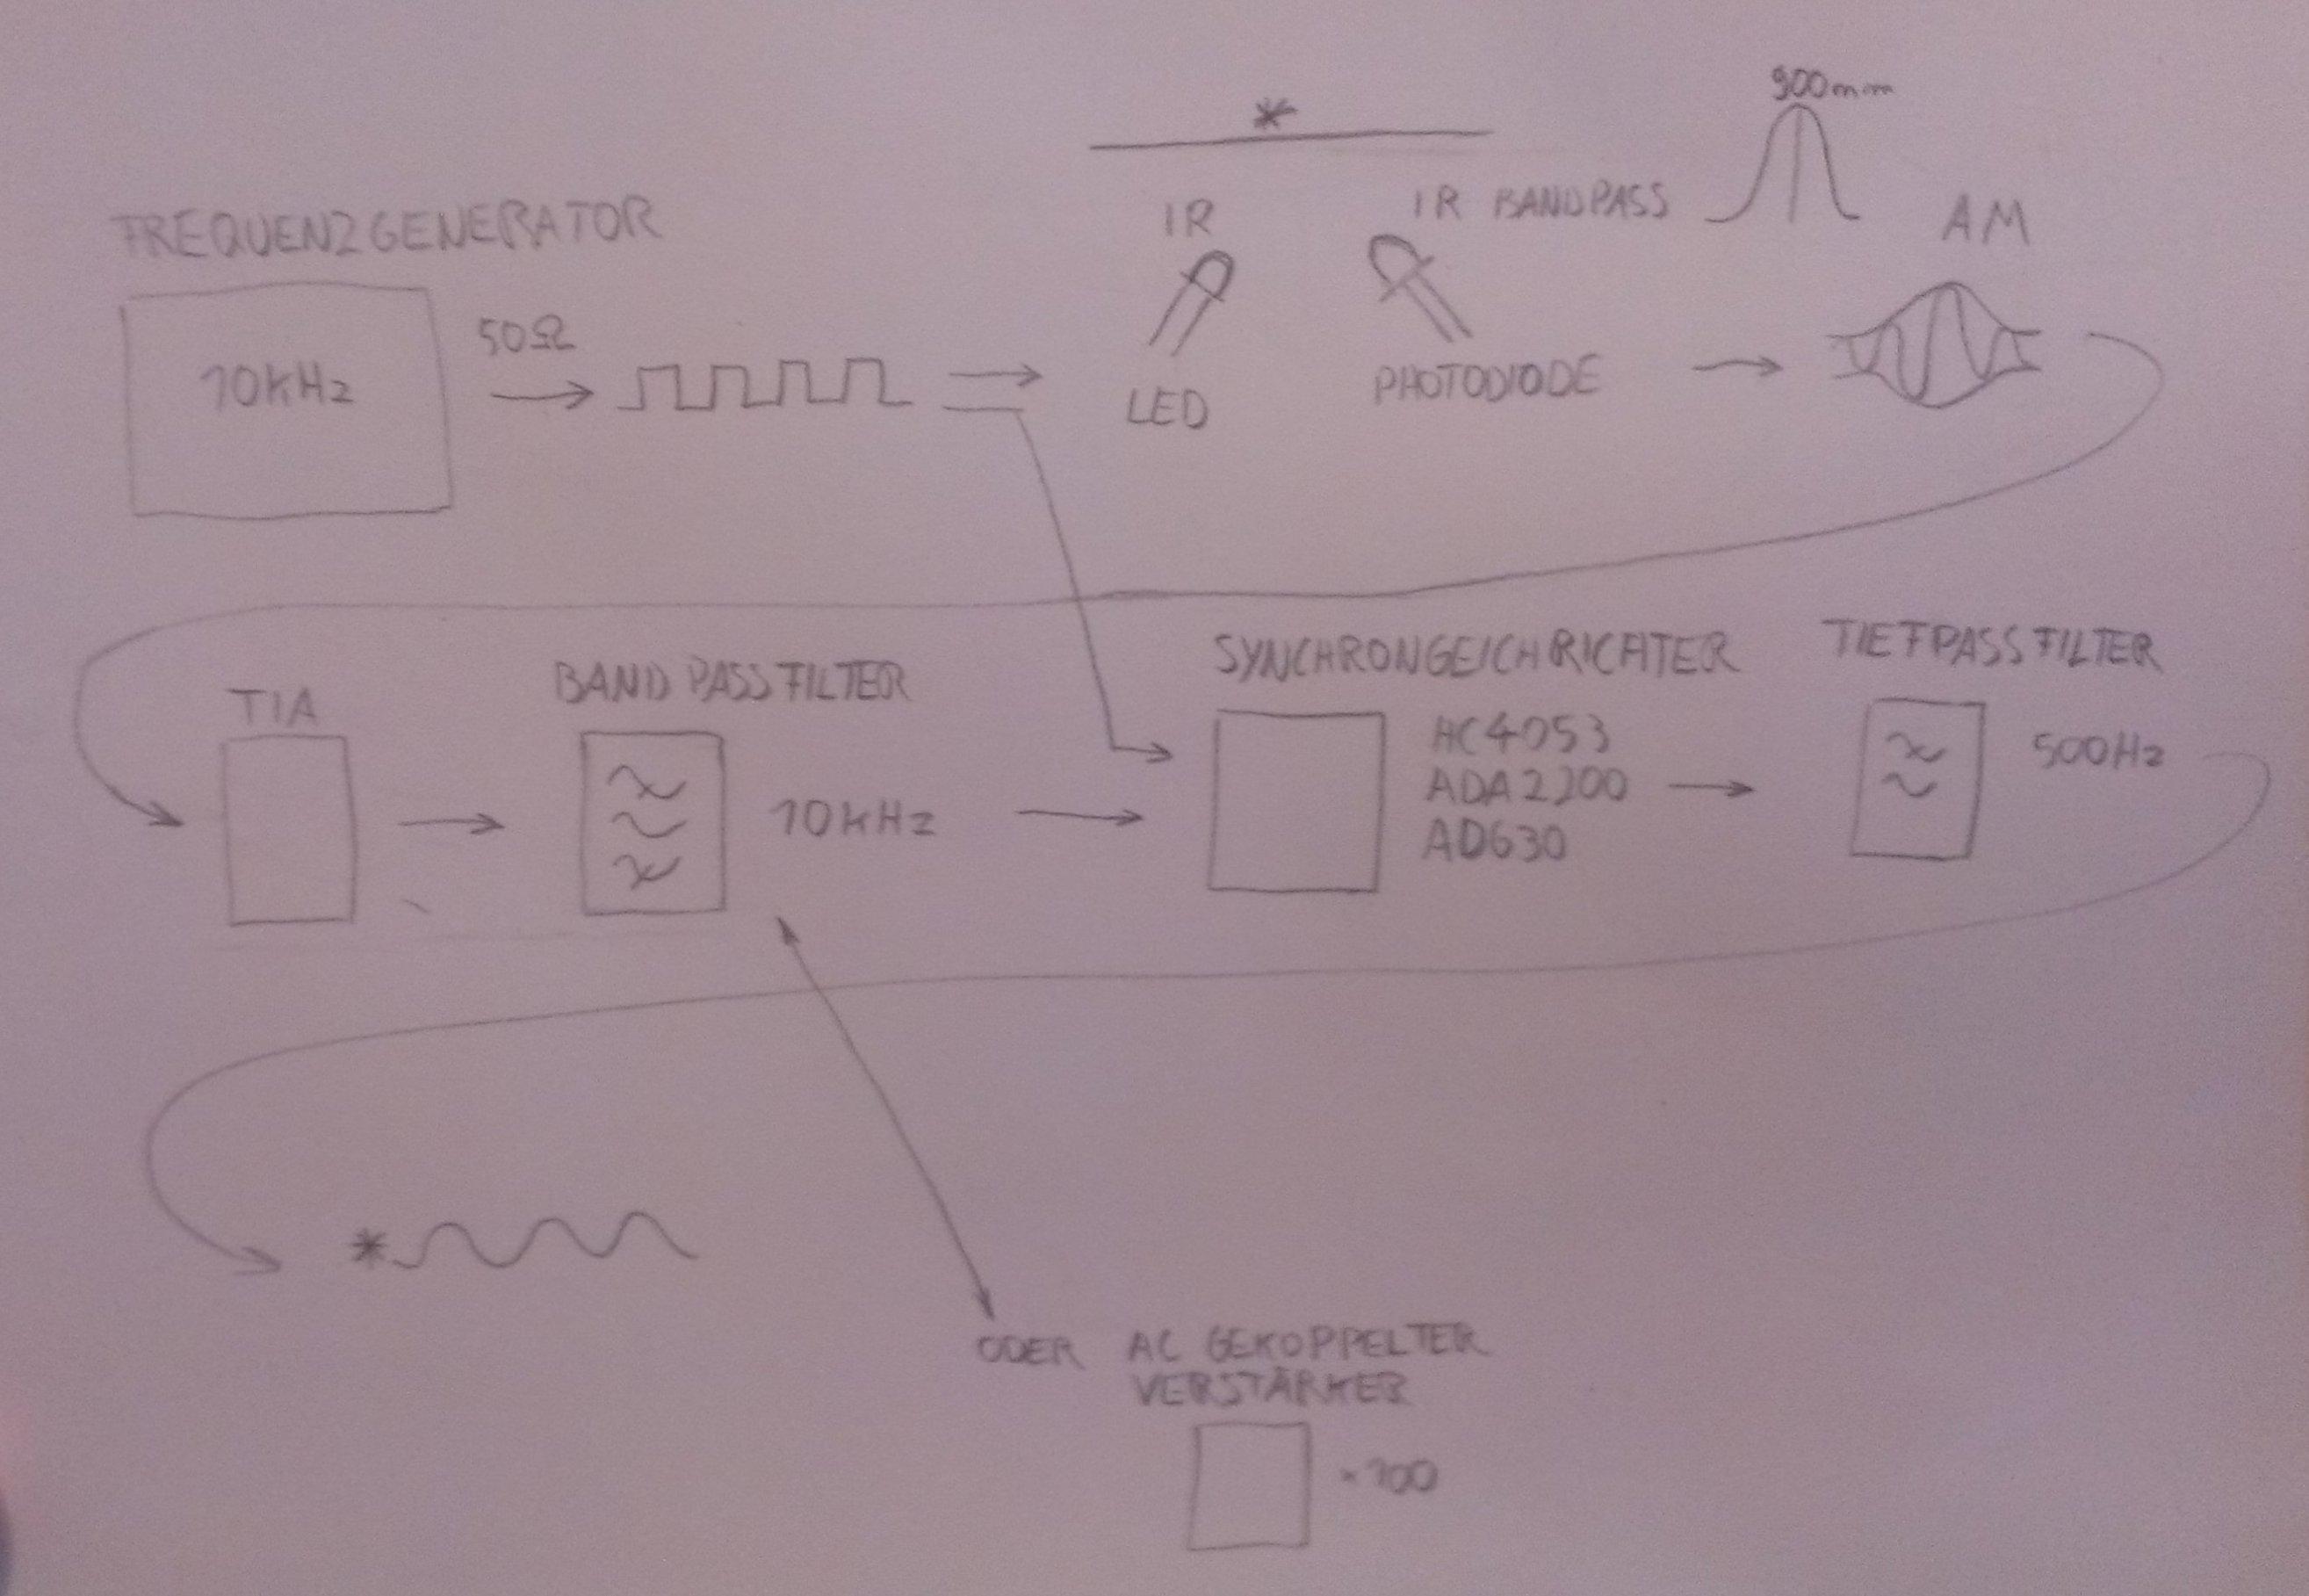 Lock In Verstärker; Vibrometer - Mikrocontroller.net